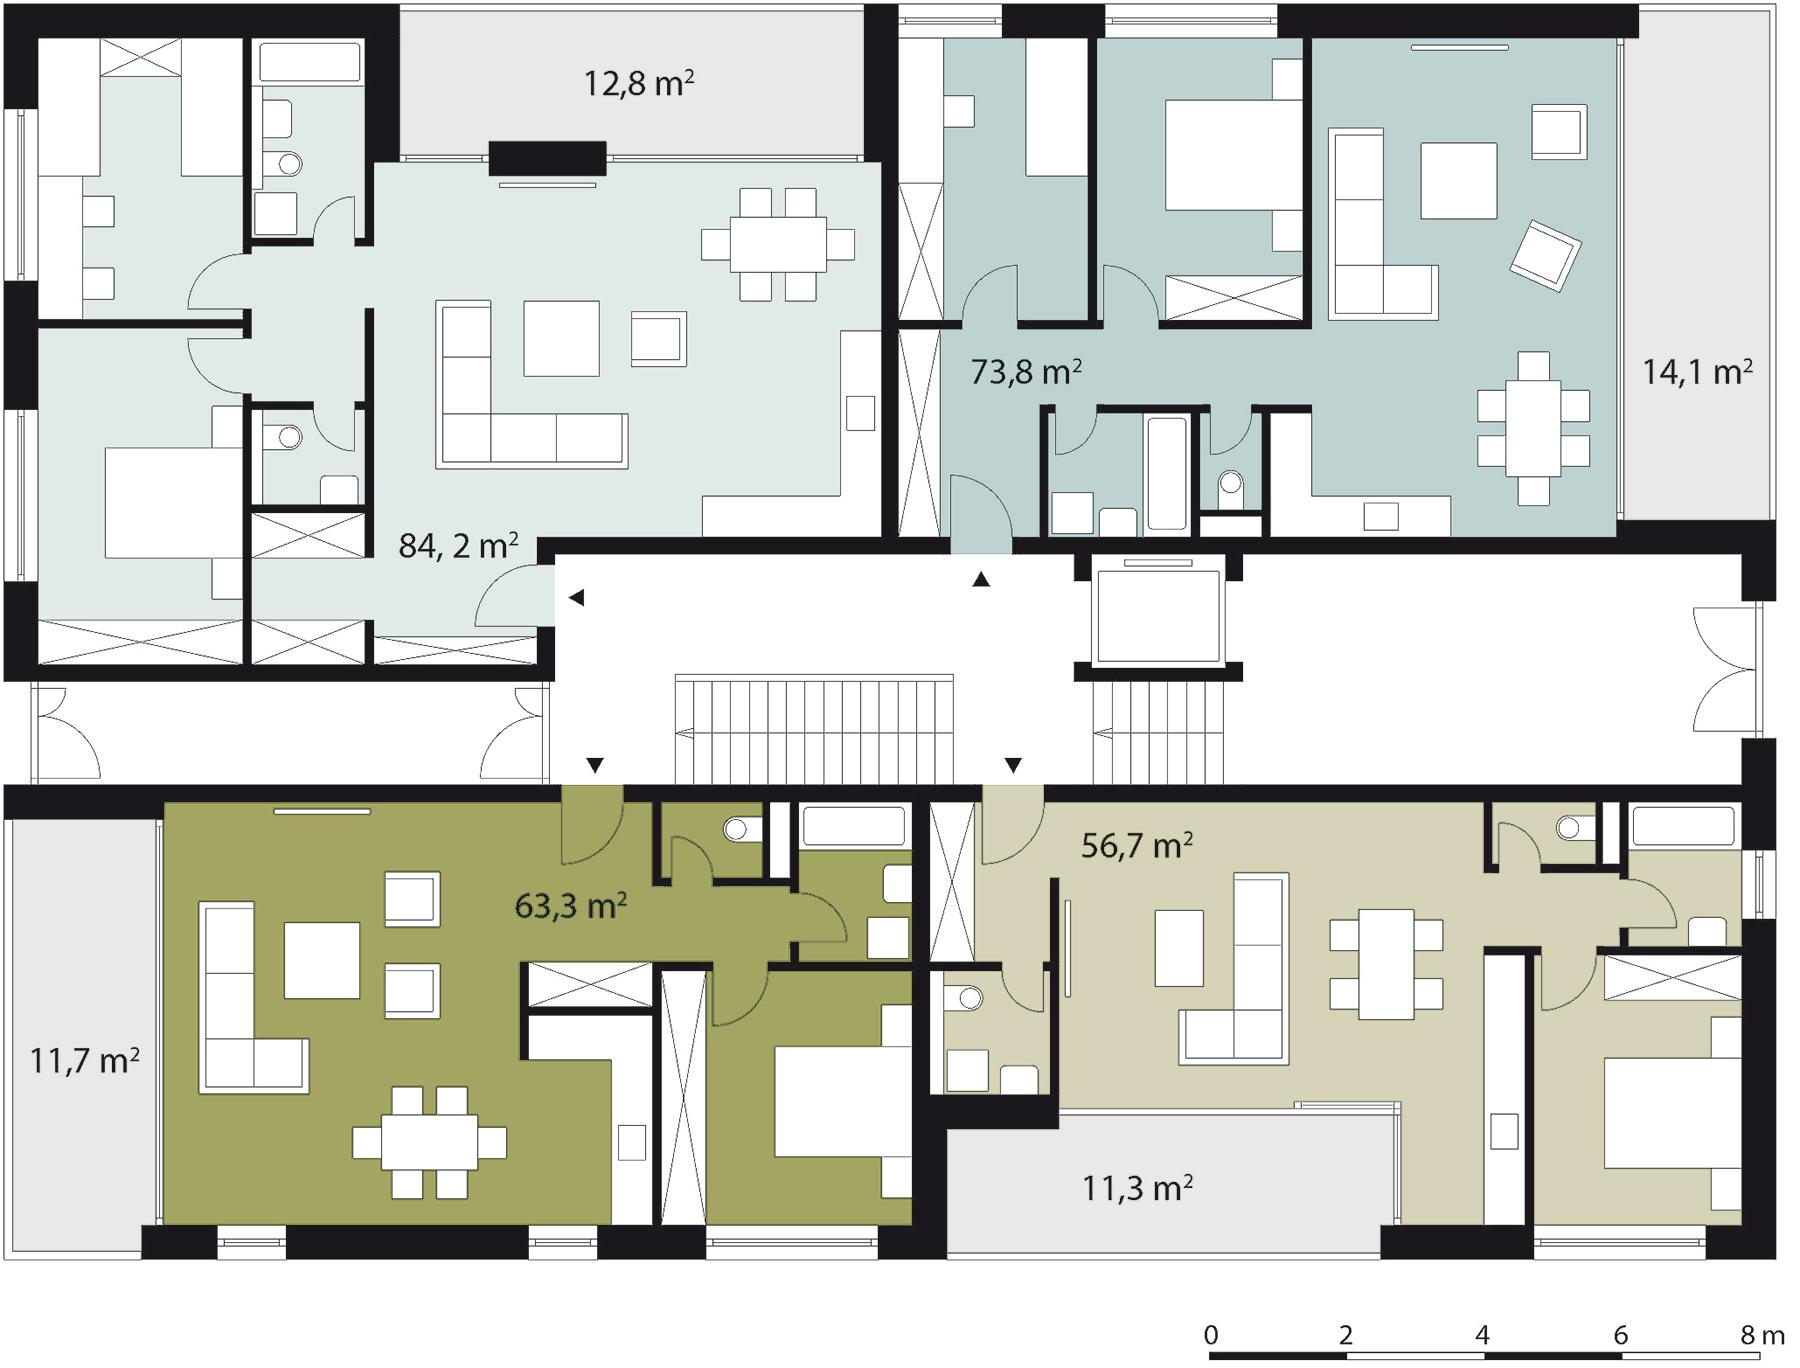 396 bytovy dom 1NP